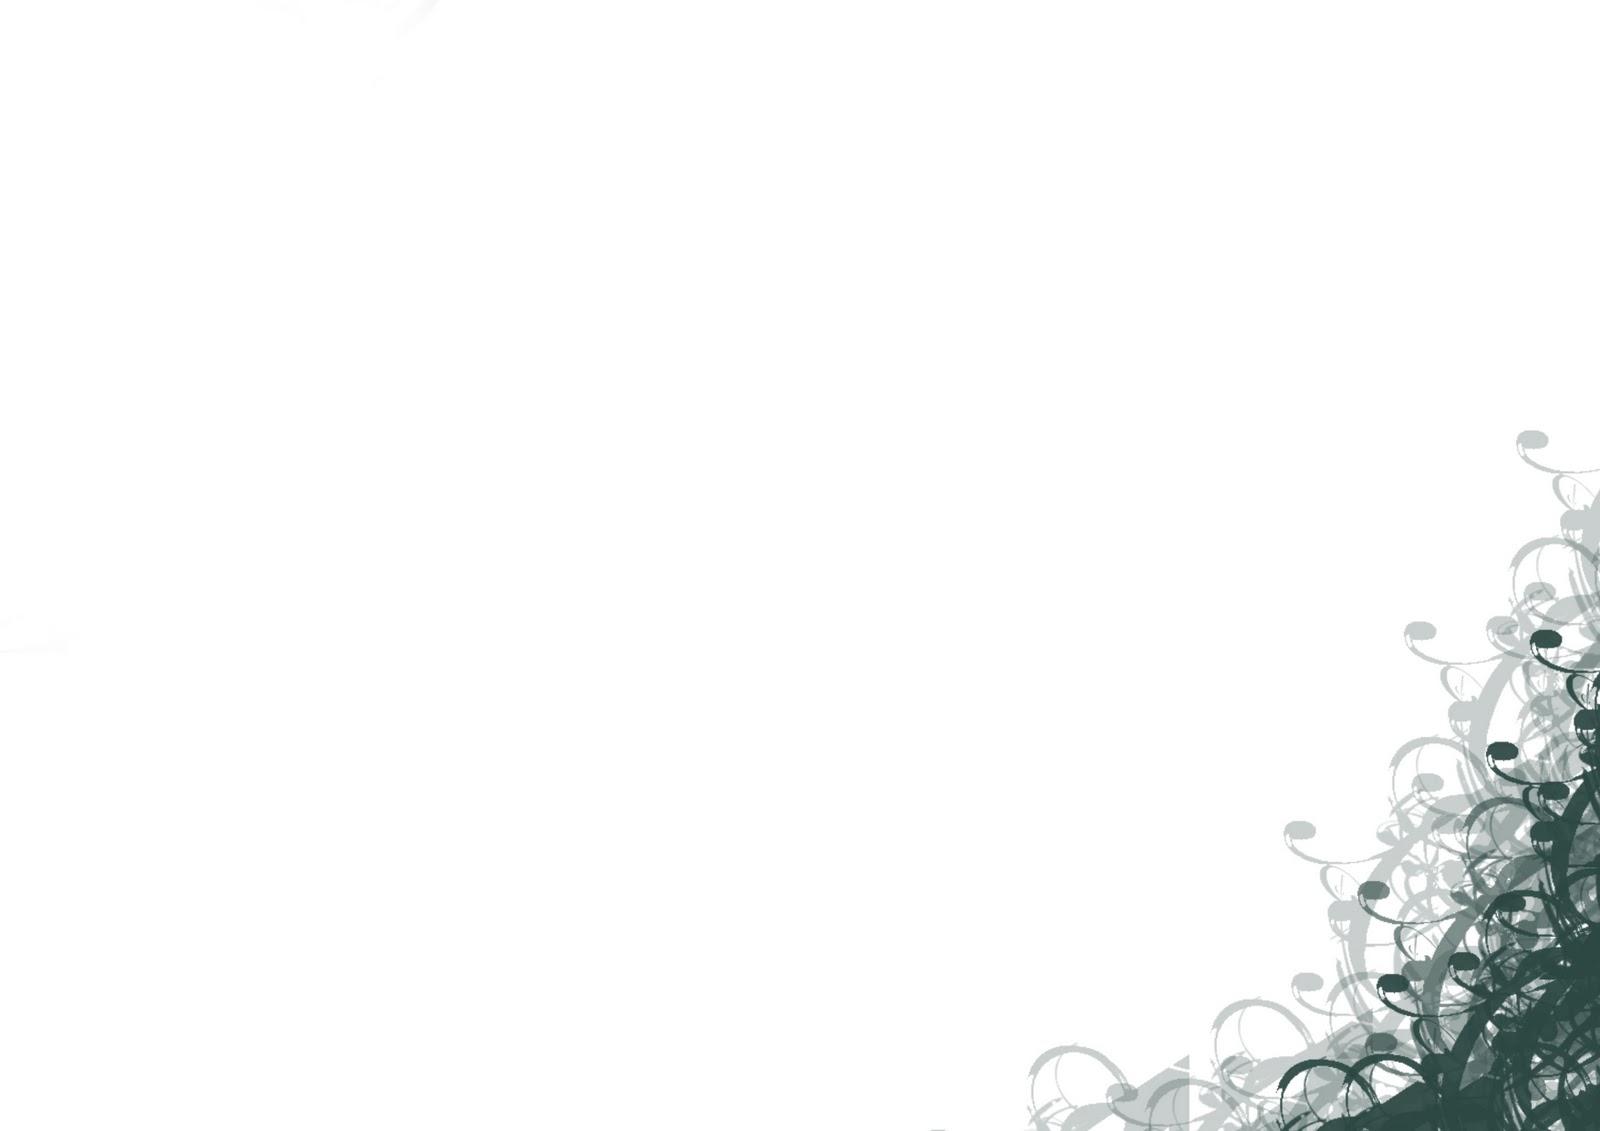 Jade Breeze: Online cv logo and background border